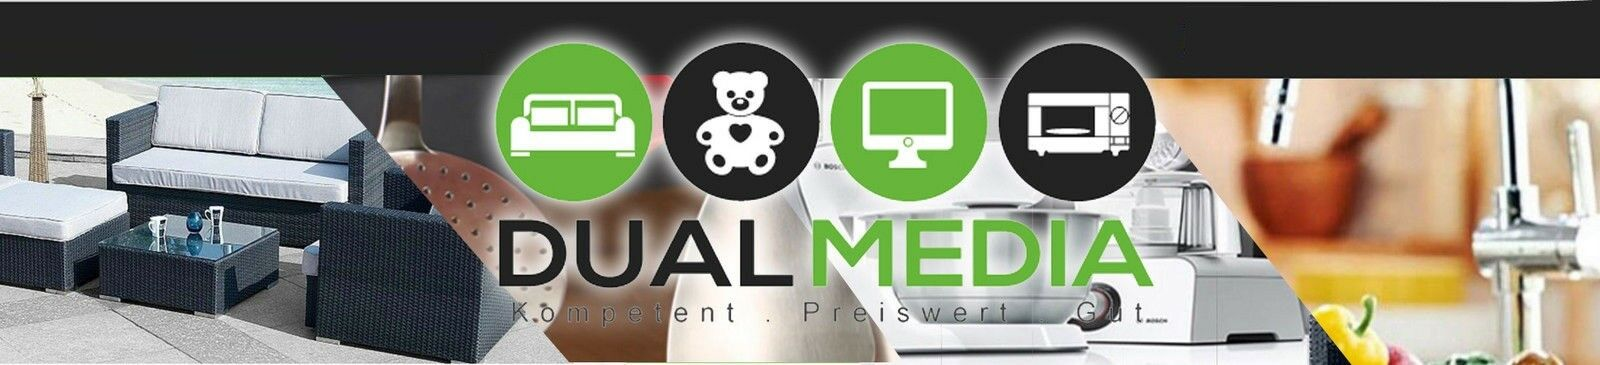 Dualmedia24